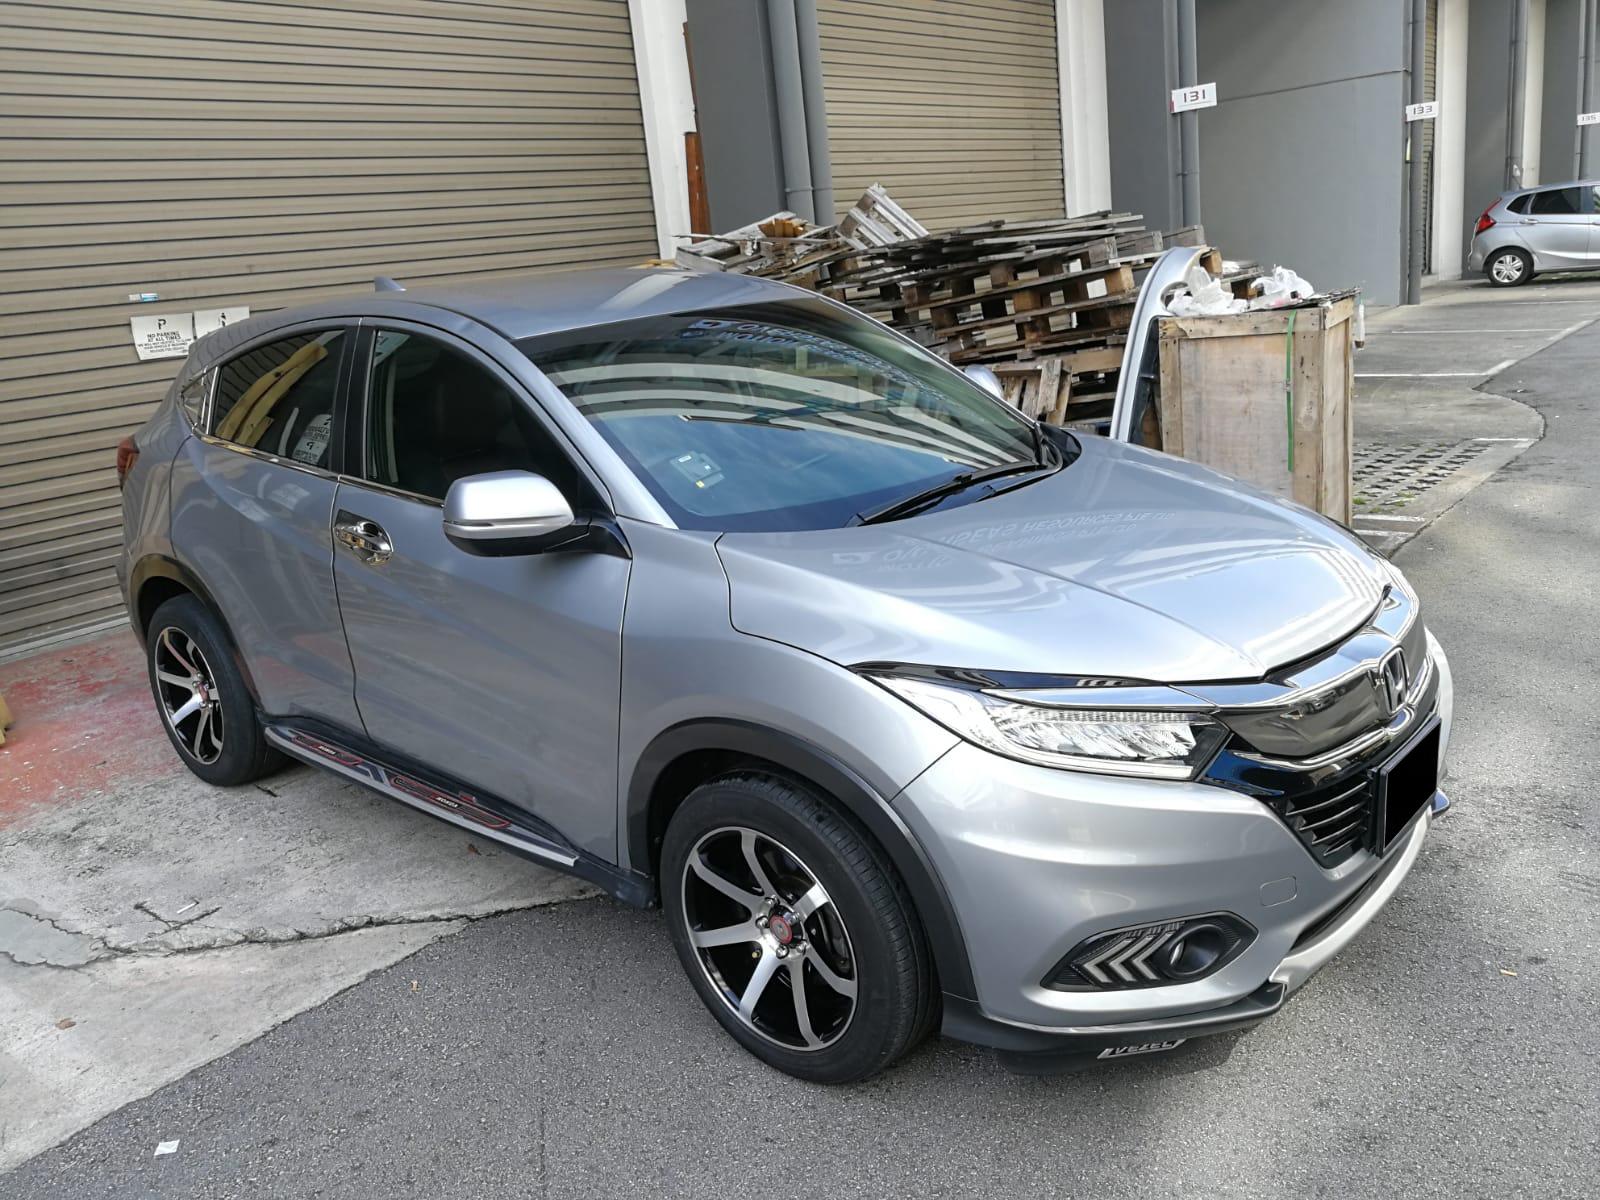 Honda Vezel Hybrid 1.5A G (For Rent)